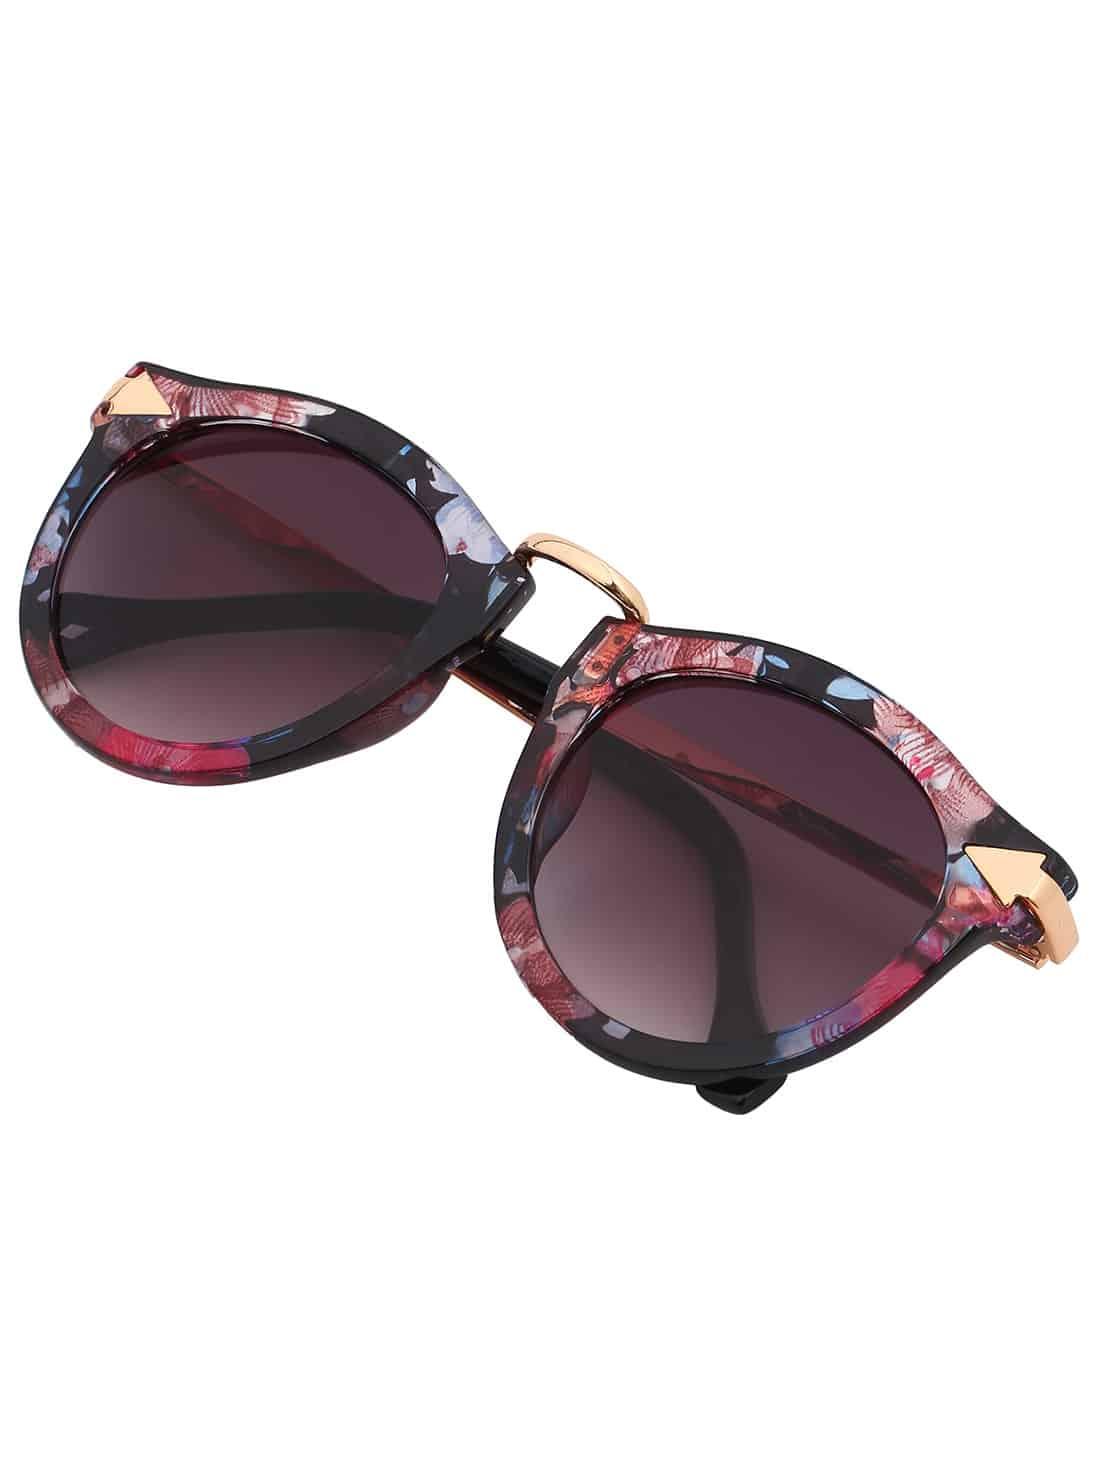 bdac0cd0136 Multi-color Plastic Frame Metal Arms Sunglasses -SheIn(Sheinside)